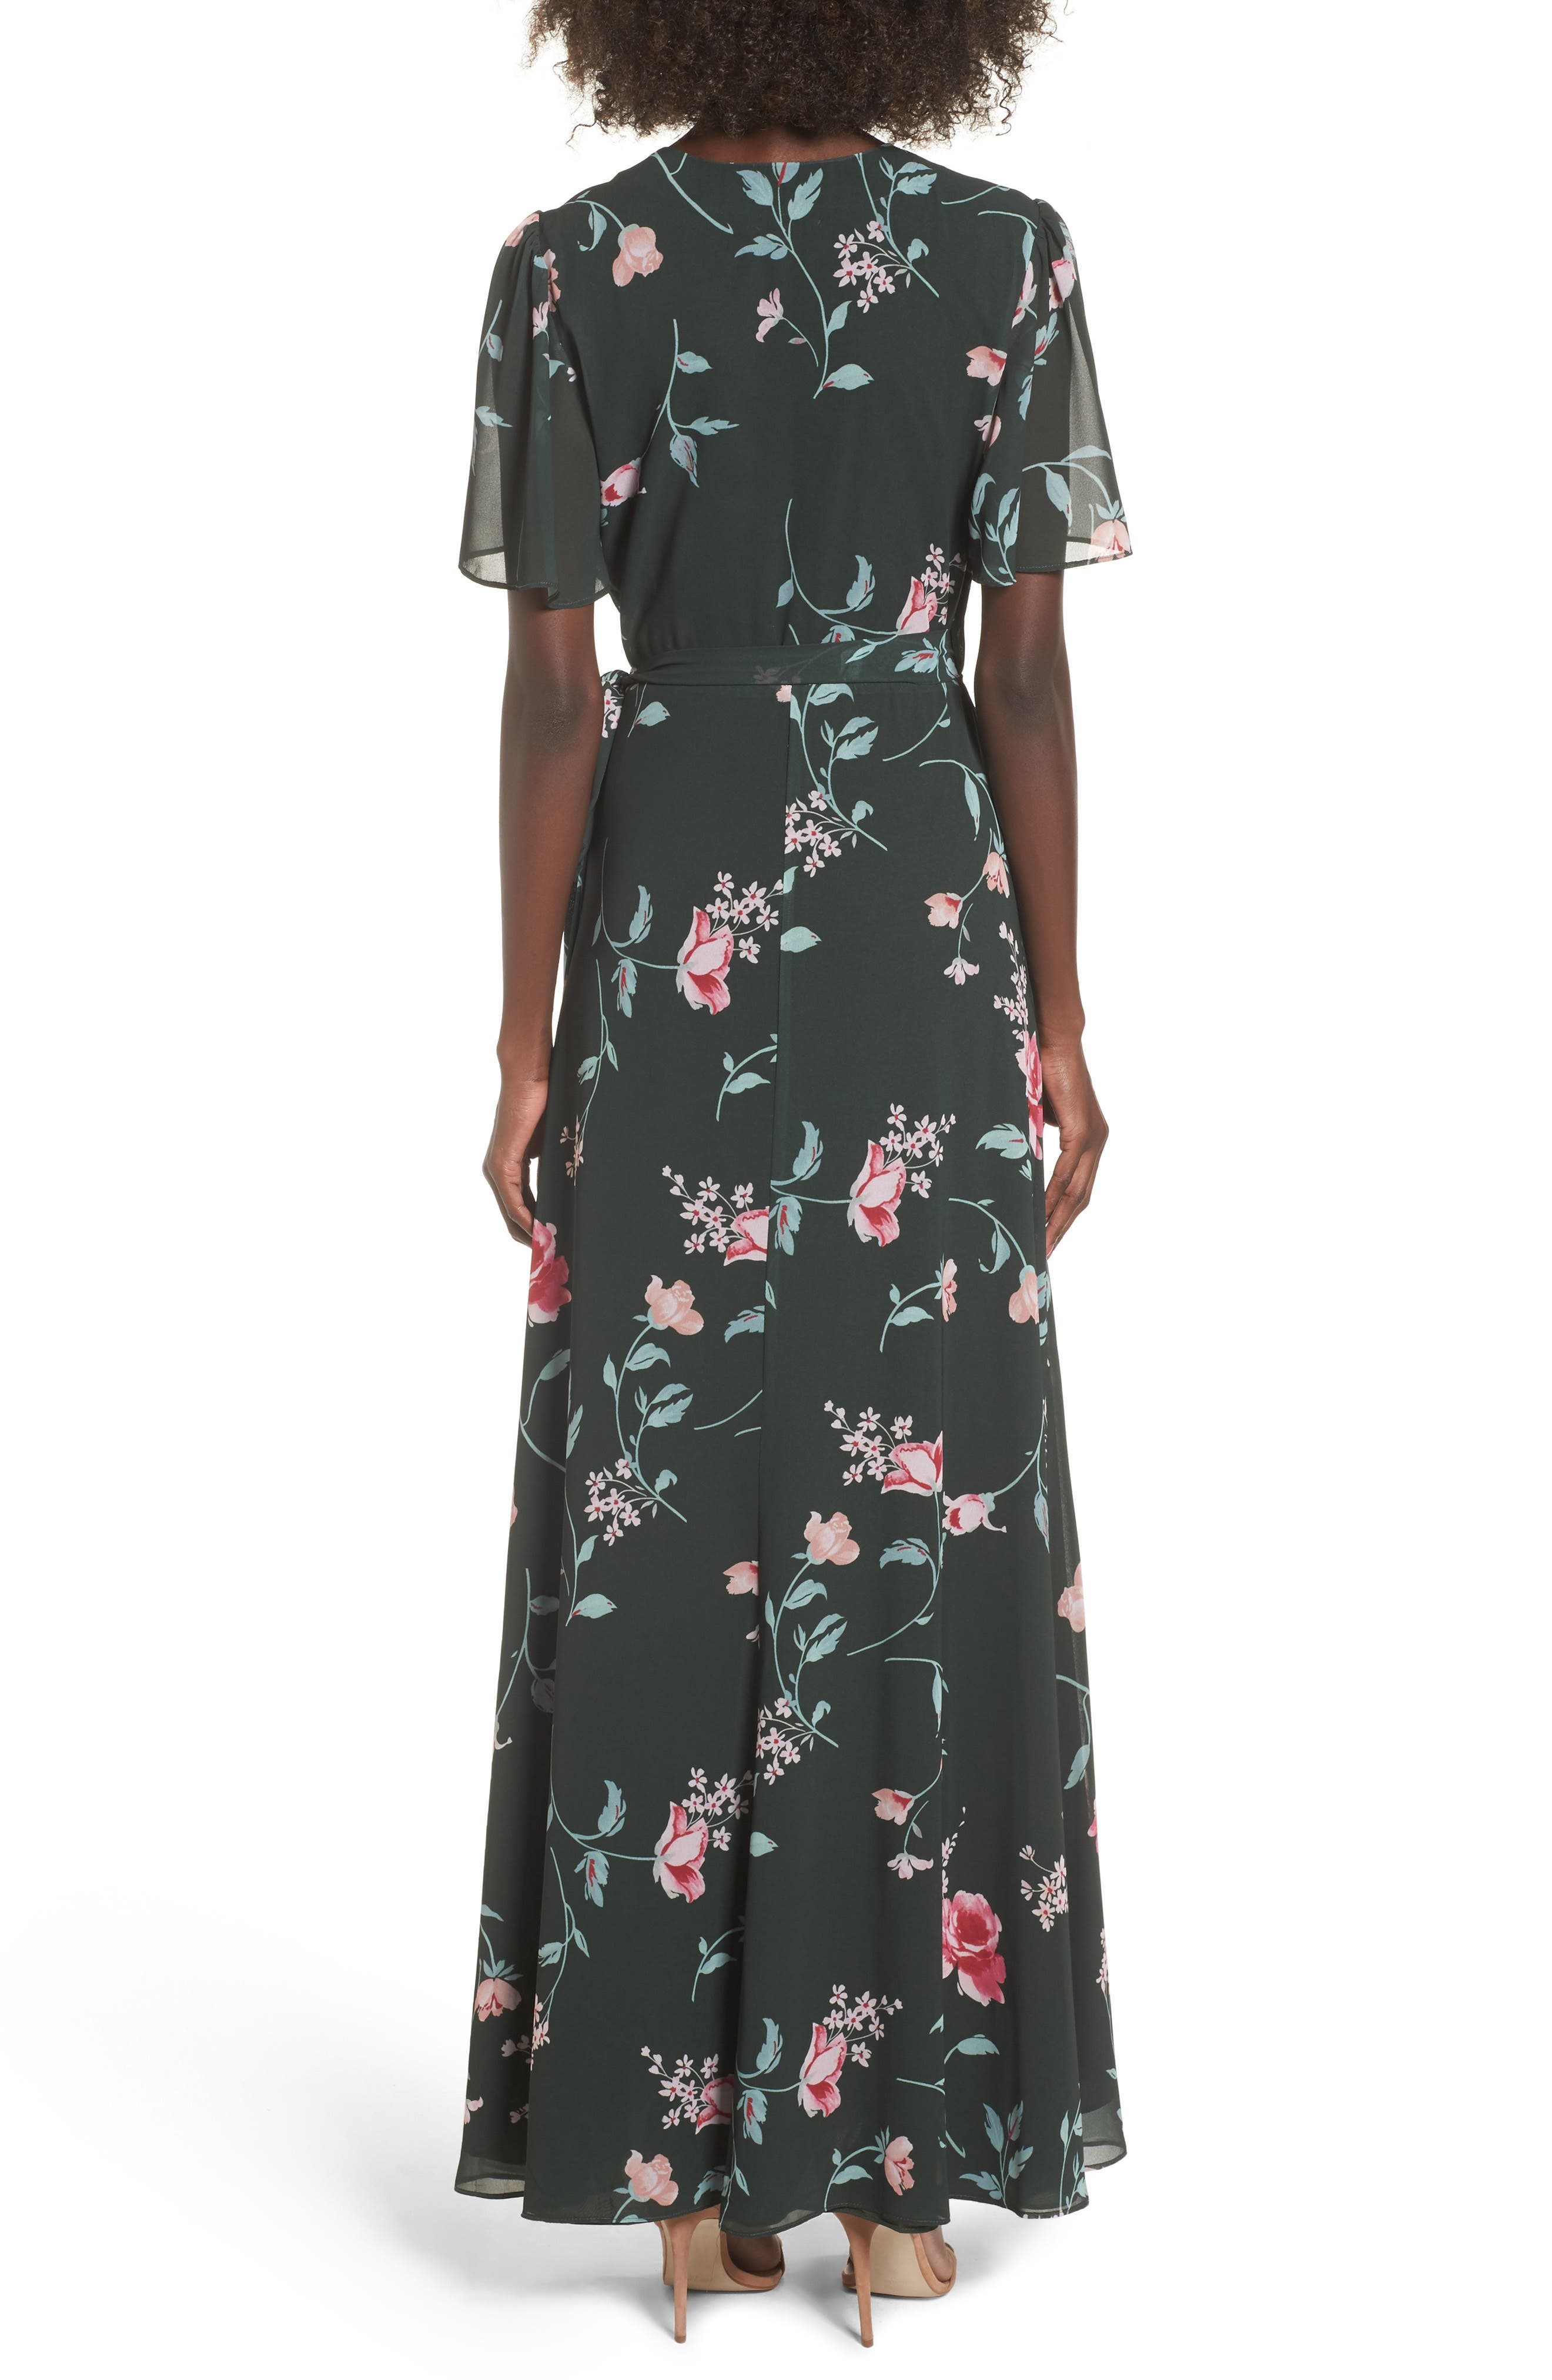 Plaza Kimono Maxi Dress,                             Alternate thumbnail 2, color,                             Evergreen Floral